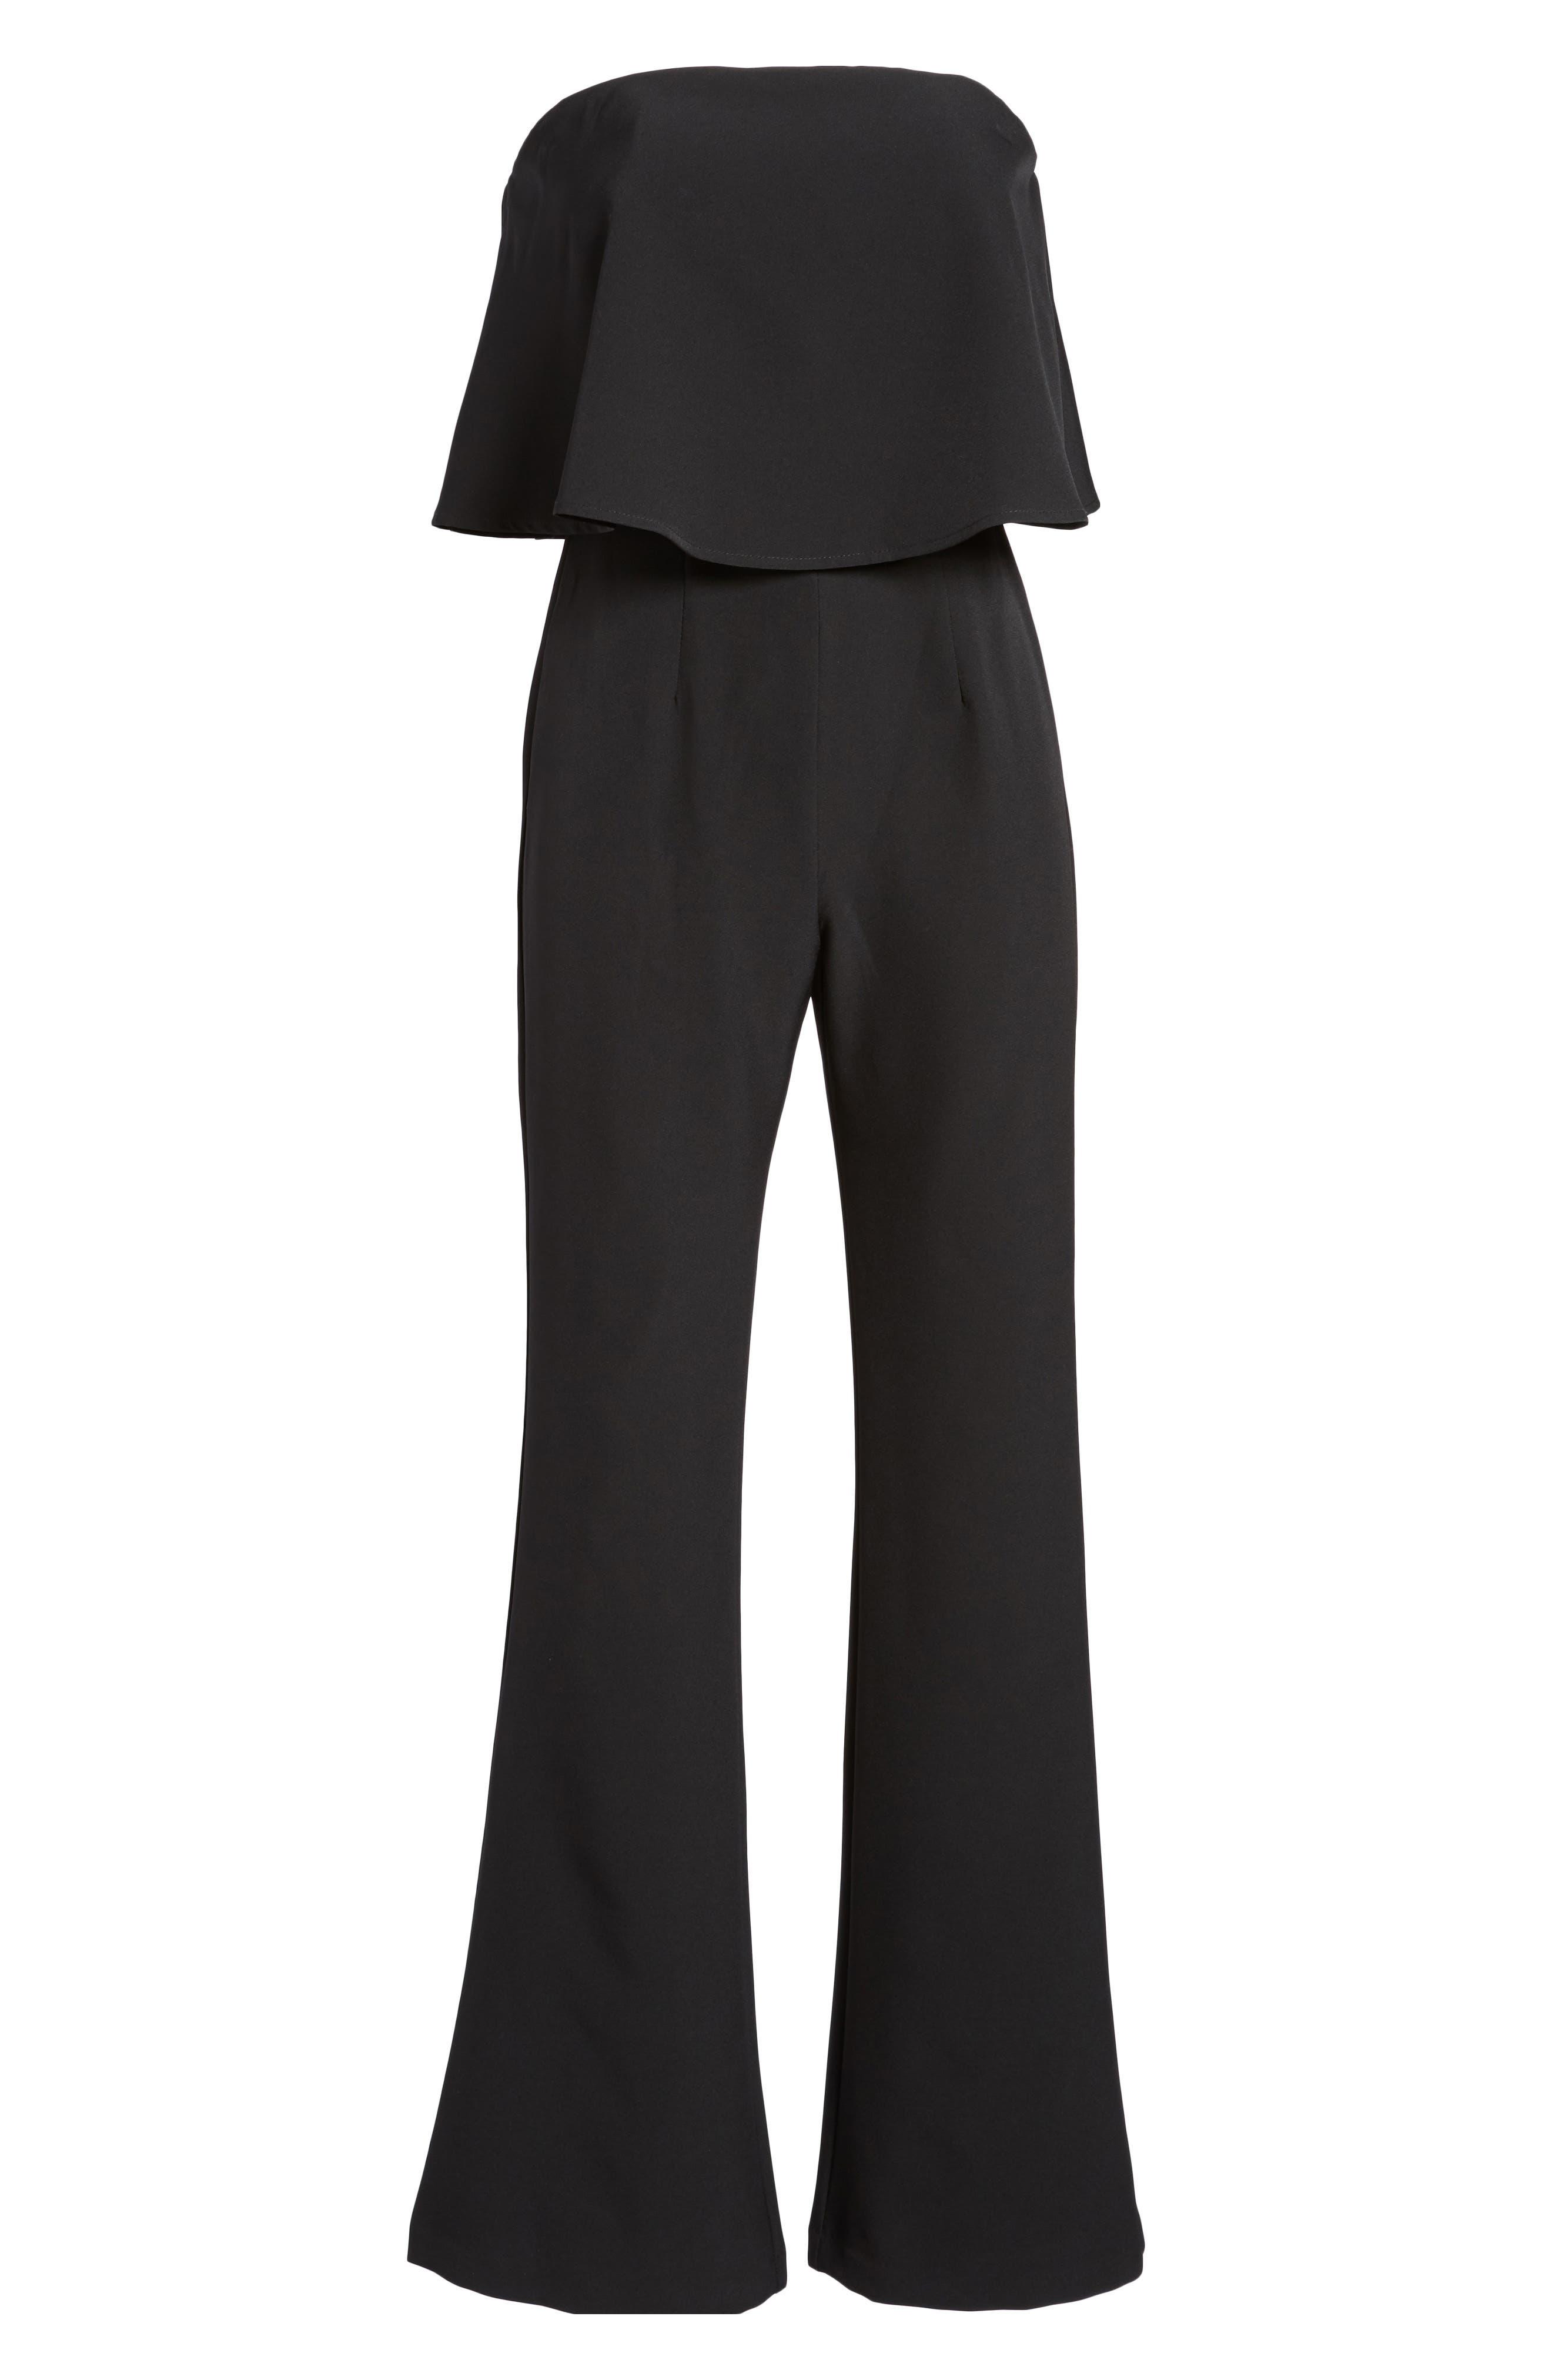 Popover Strapless Jumpsuit,                             Alternate thumbnail 6, color,                             Black